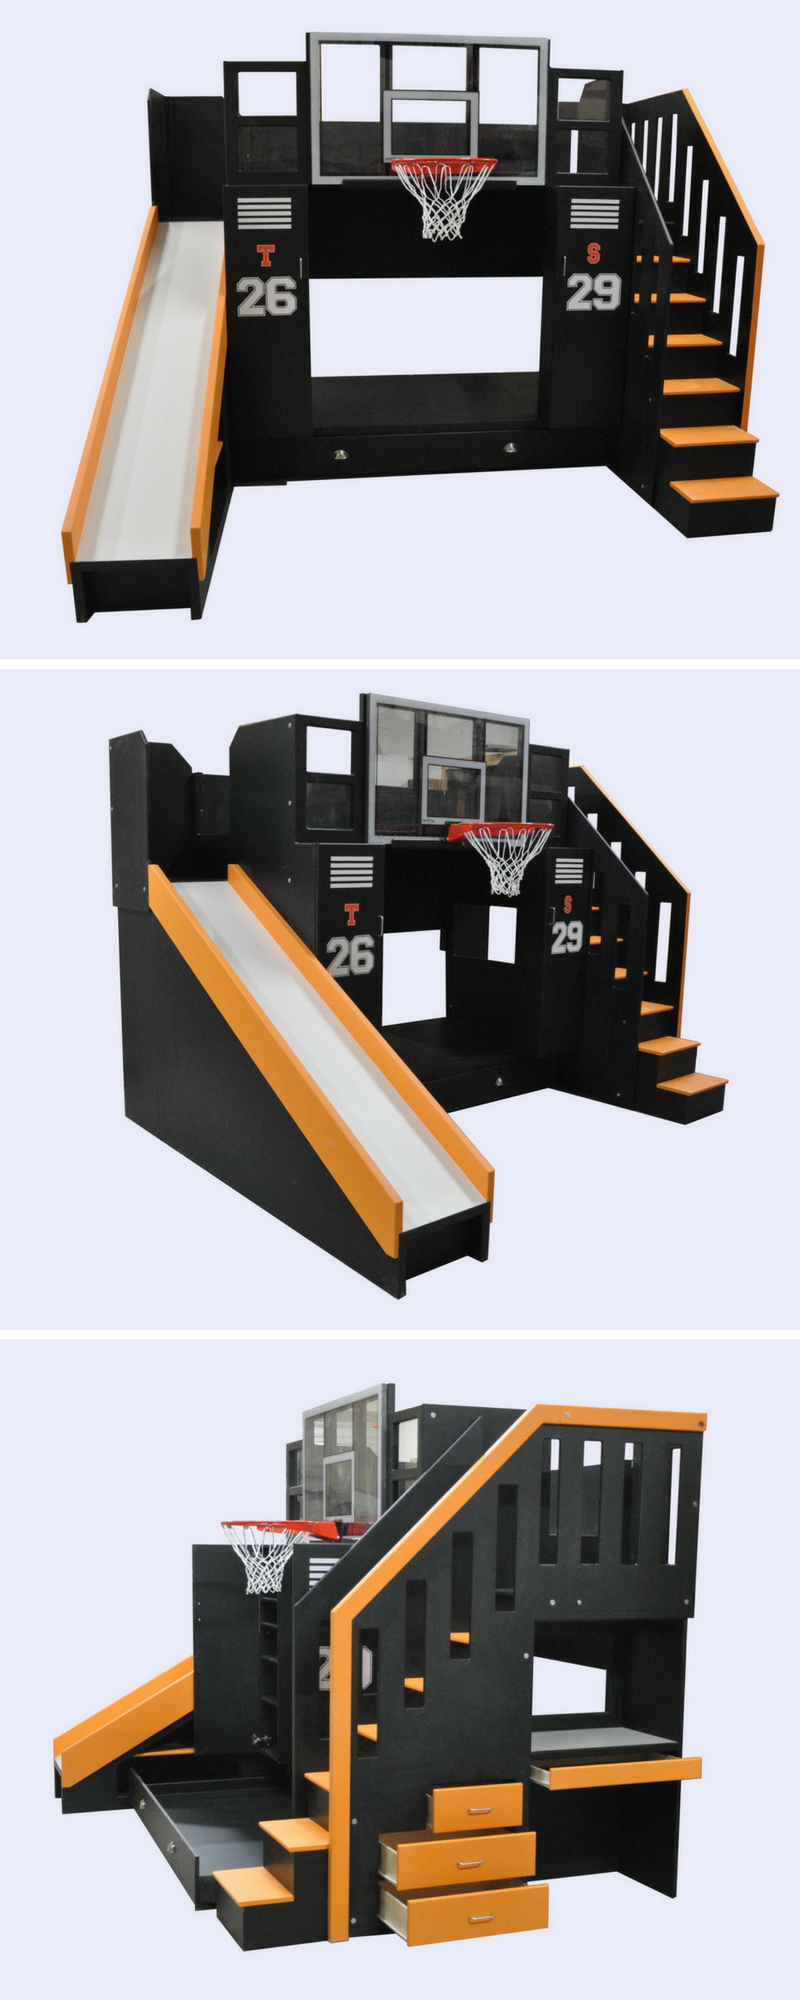 Basketball Bunk The Ultimate Kids bunk beds, Kid beds